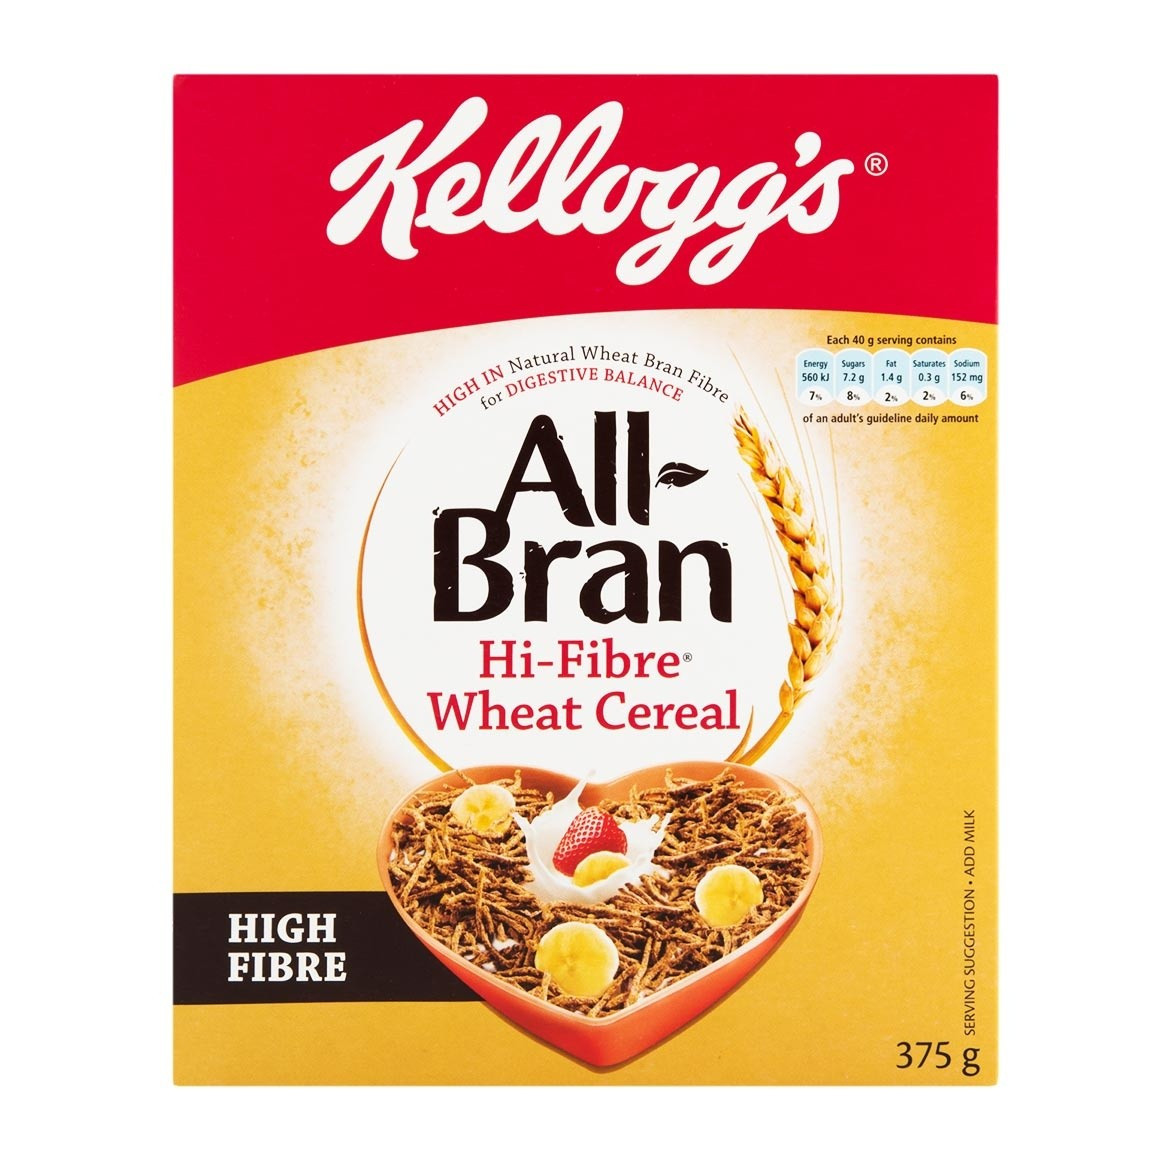 High Fibre Breakfast Cereals  high fiber breakfast cereal